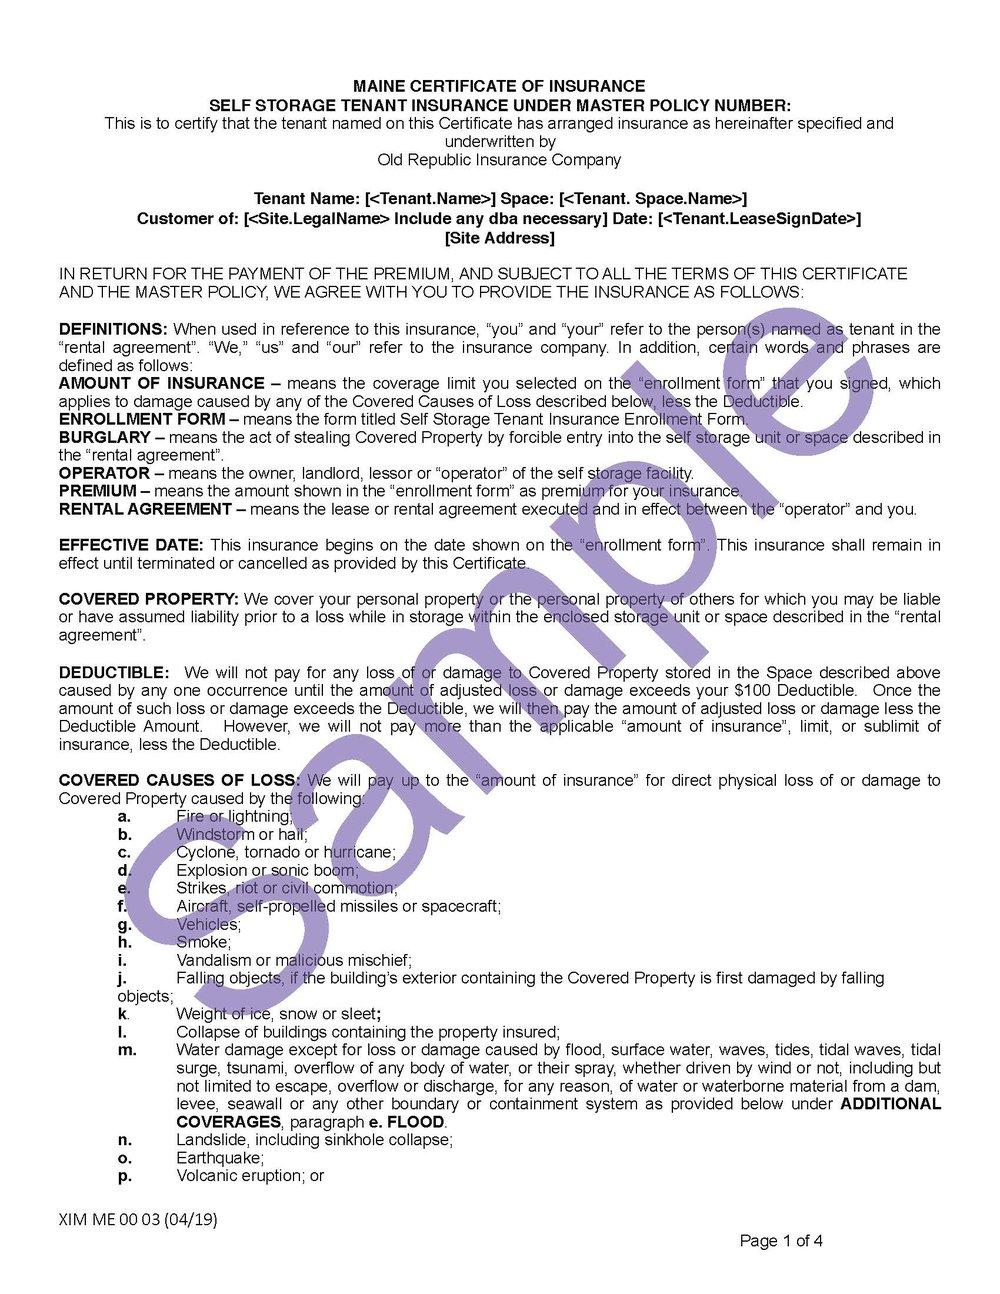 XIM ME 00 03 04 19 Maine Certificate of InsuranceSample_Page_1.jpg